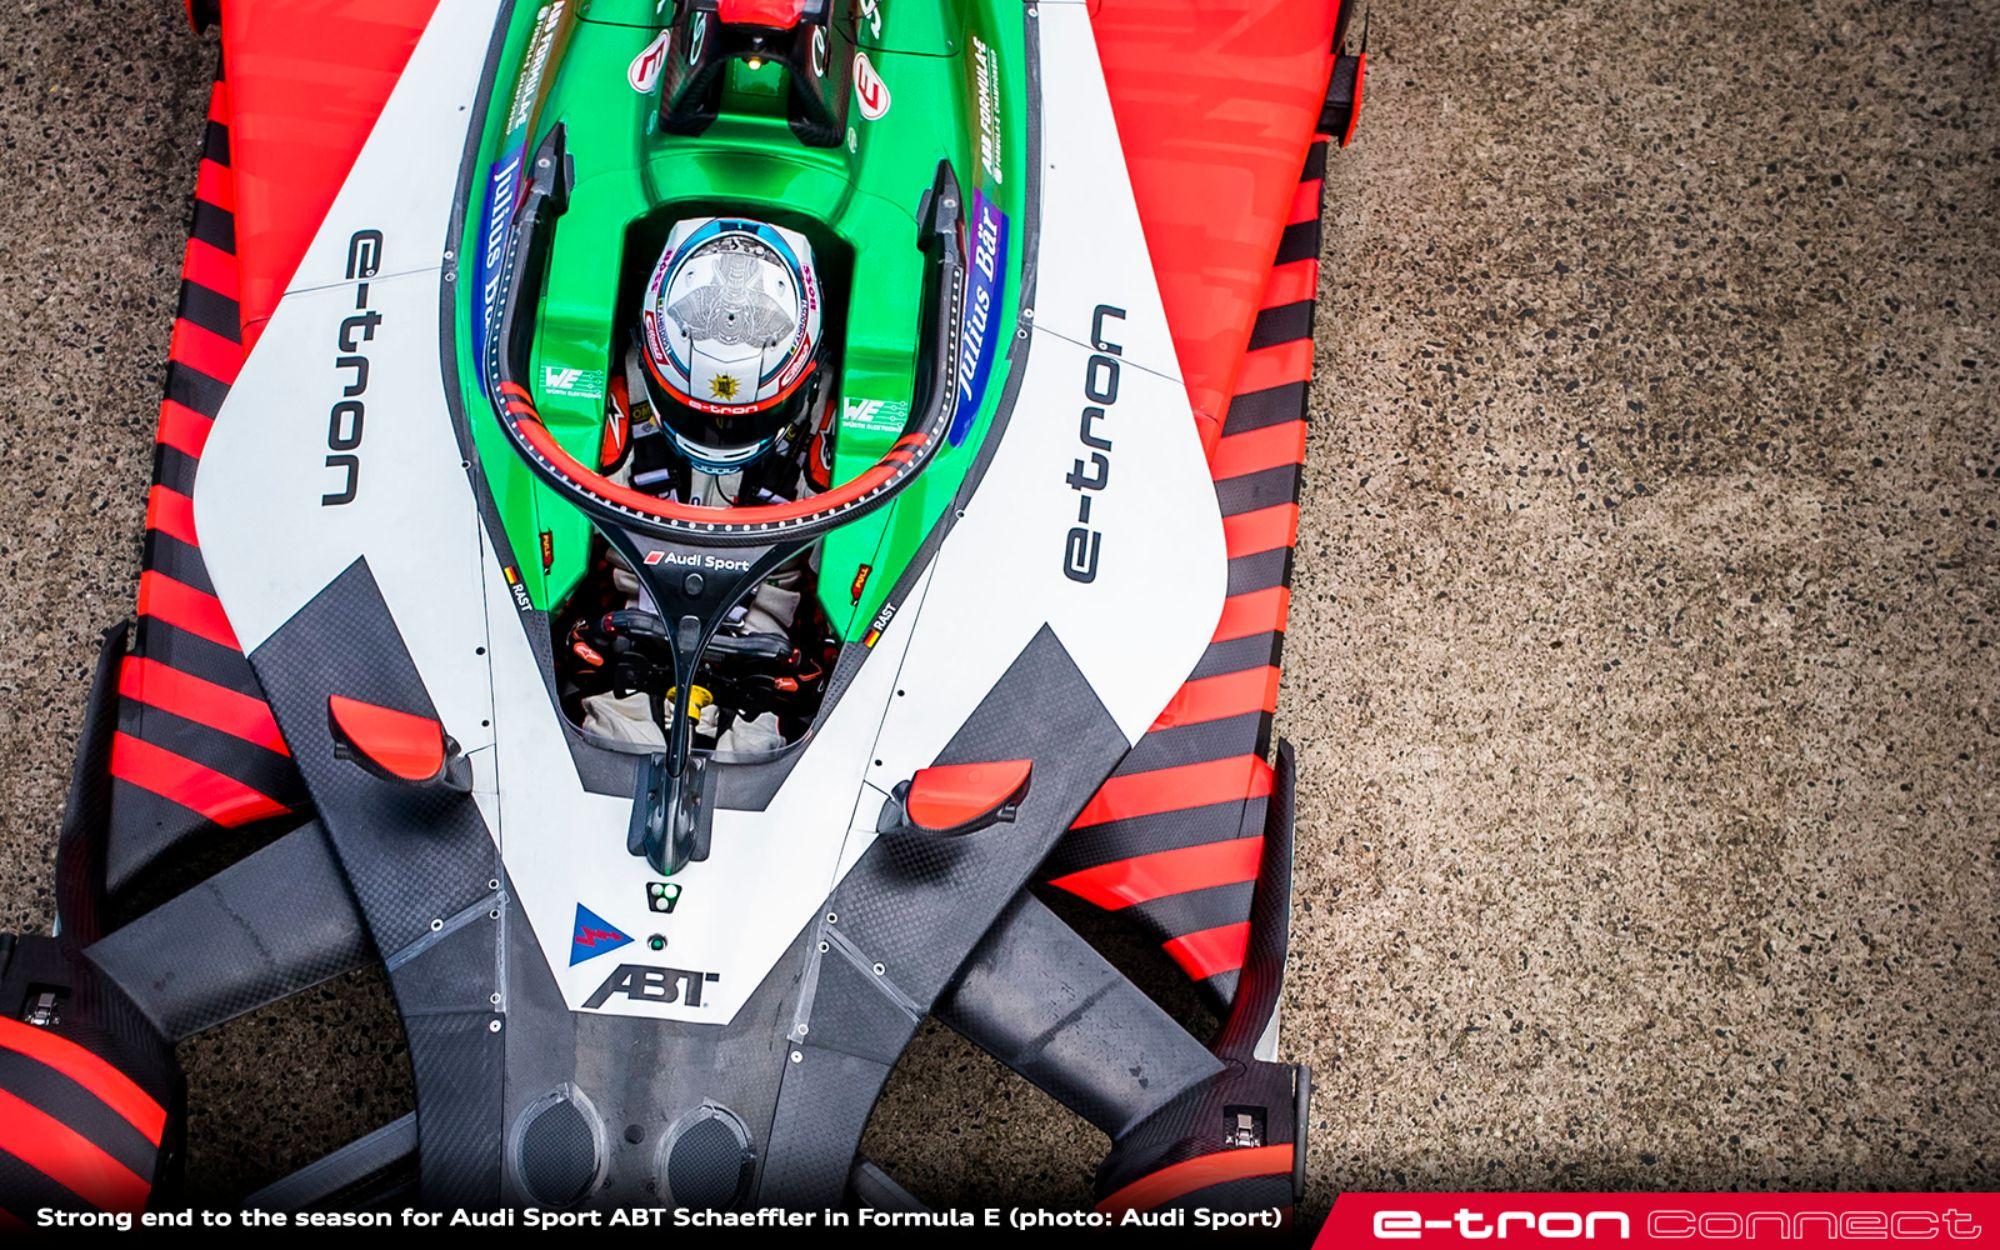 Strong End to the Season for Audi Sport ABT Schaeffler in Formula E